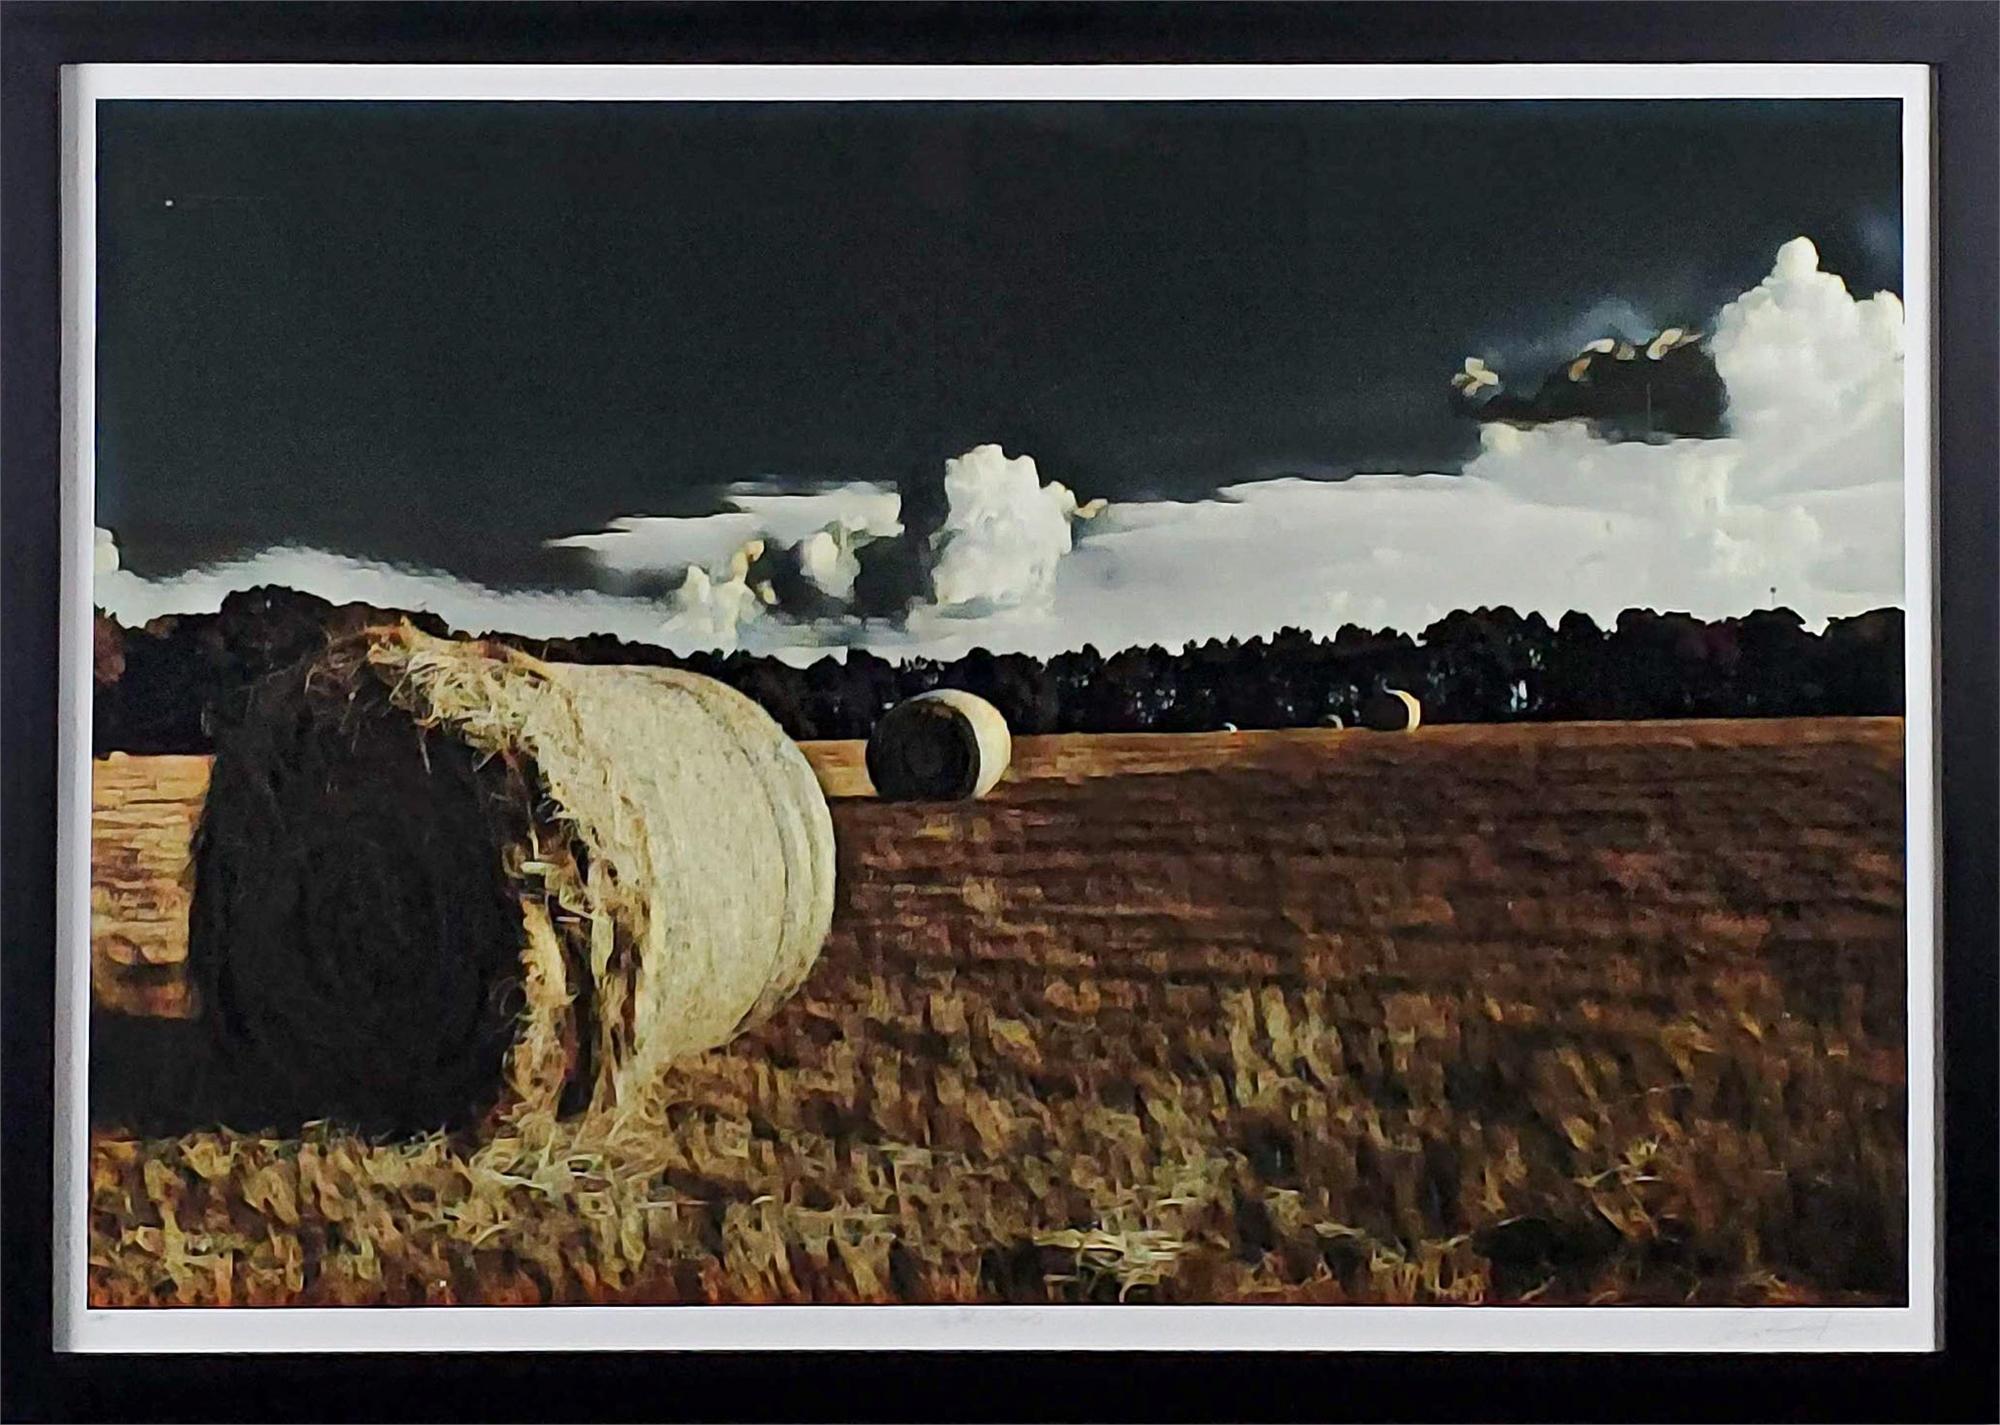 Hayroll by Robert Santore